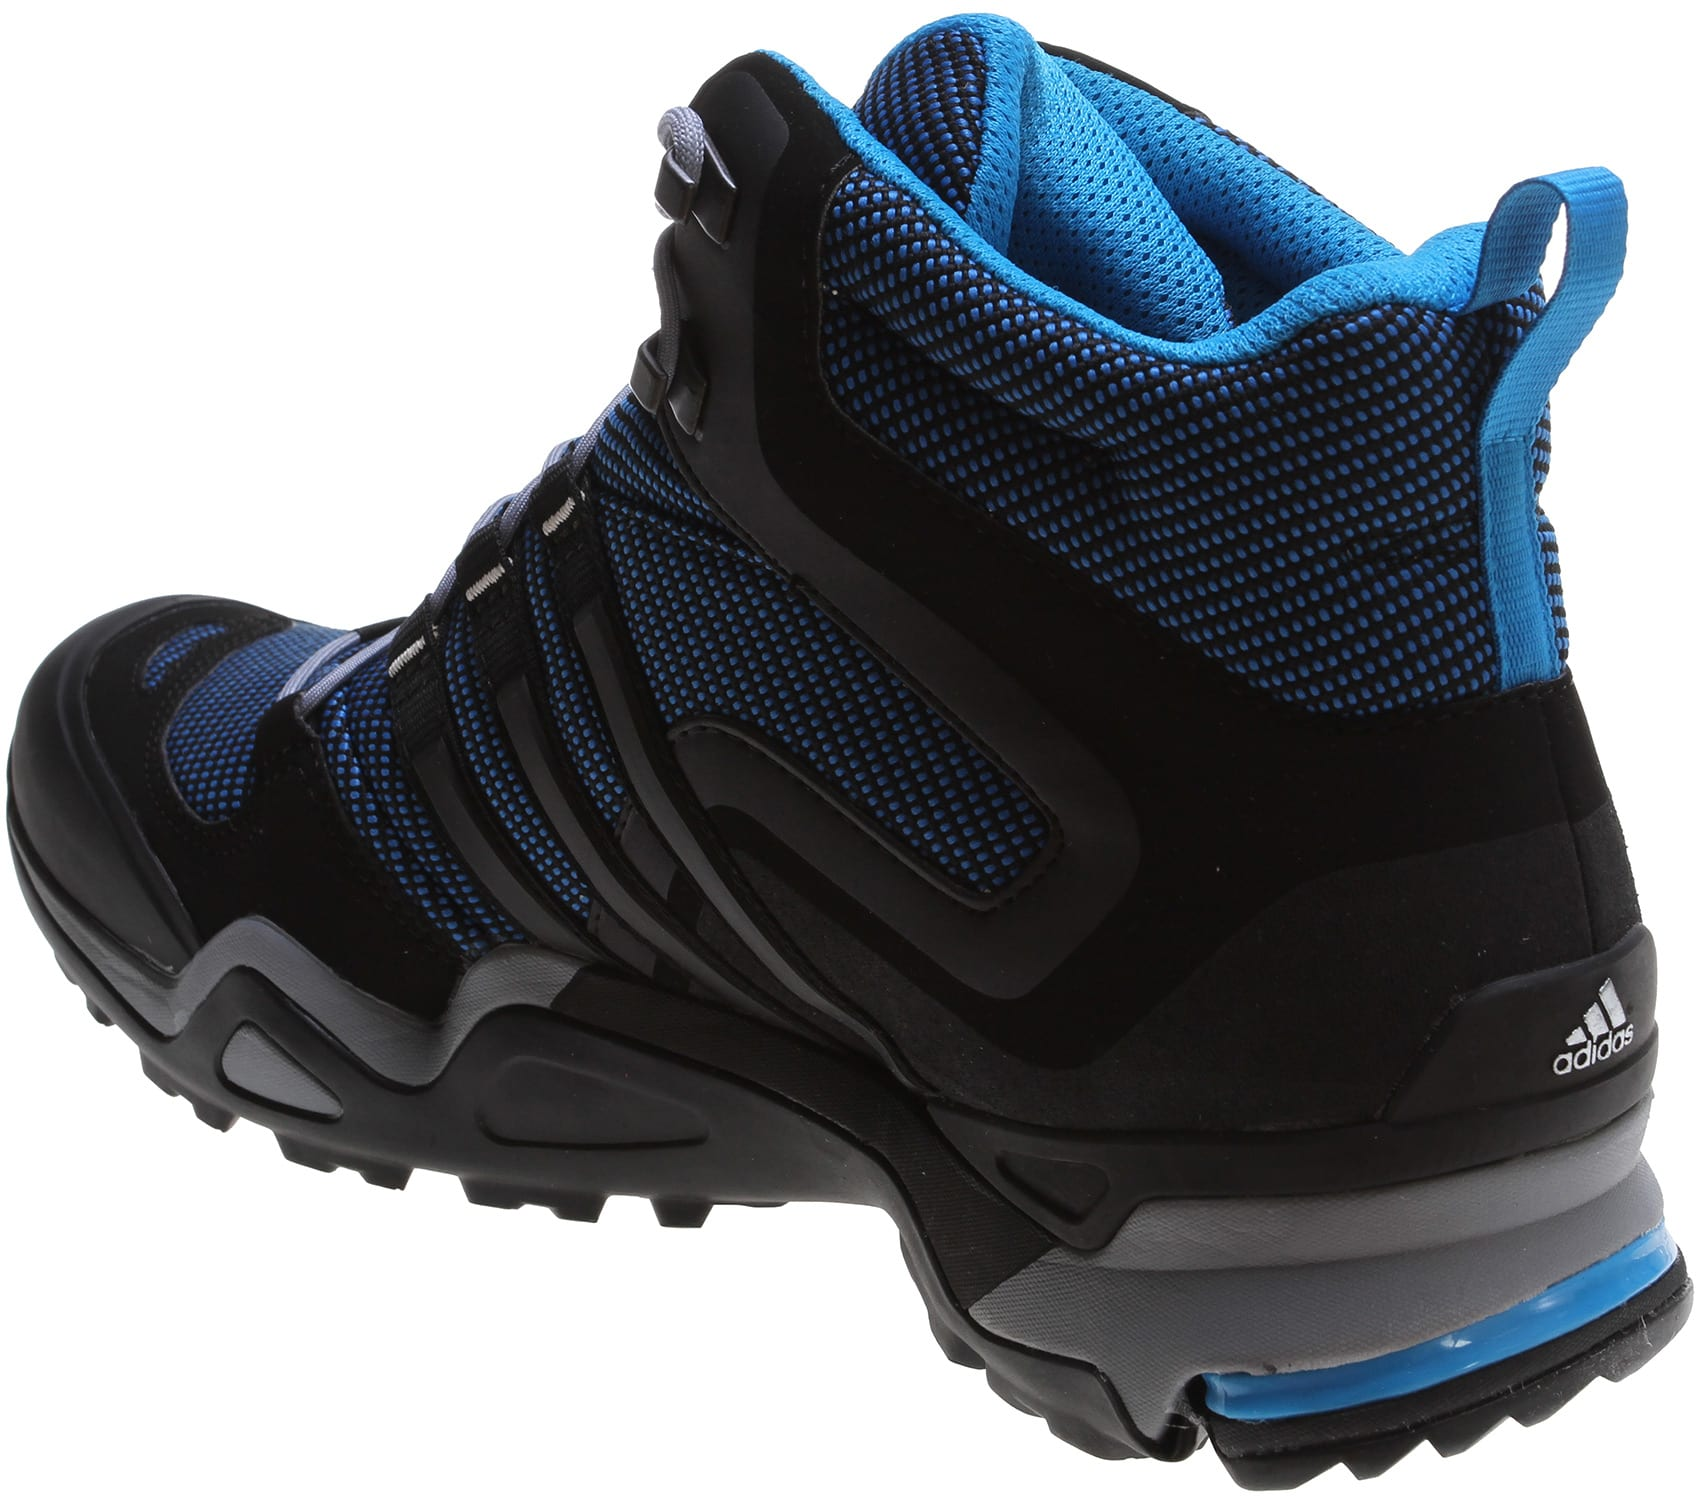 Adidas Terrex Fast X High Gtx Hiking Shoes